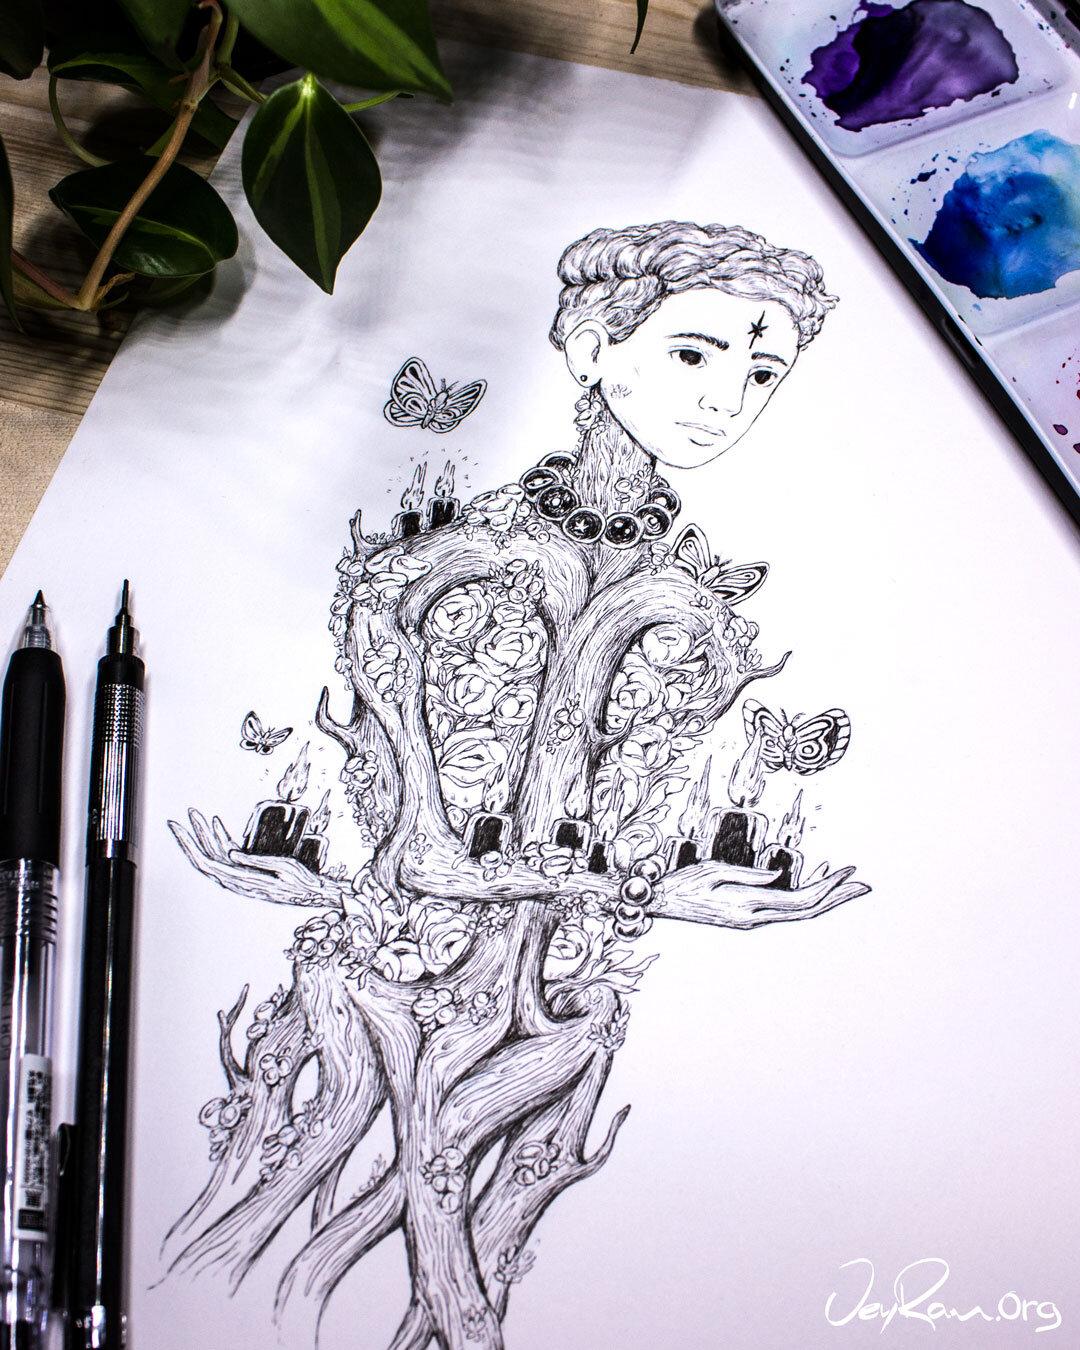 Aleuria Aurantia Wizard Ink Drawing :  Ballpoint Pen Art by JeyRam. I'm an artist from Toronto that specializes in simple and elegant ink drawing! #inktober #inkart #originalart #inktober2019